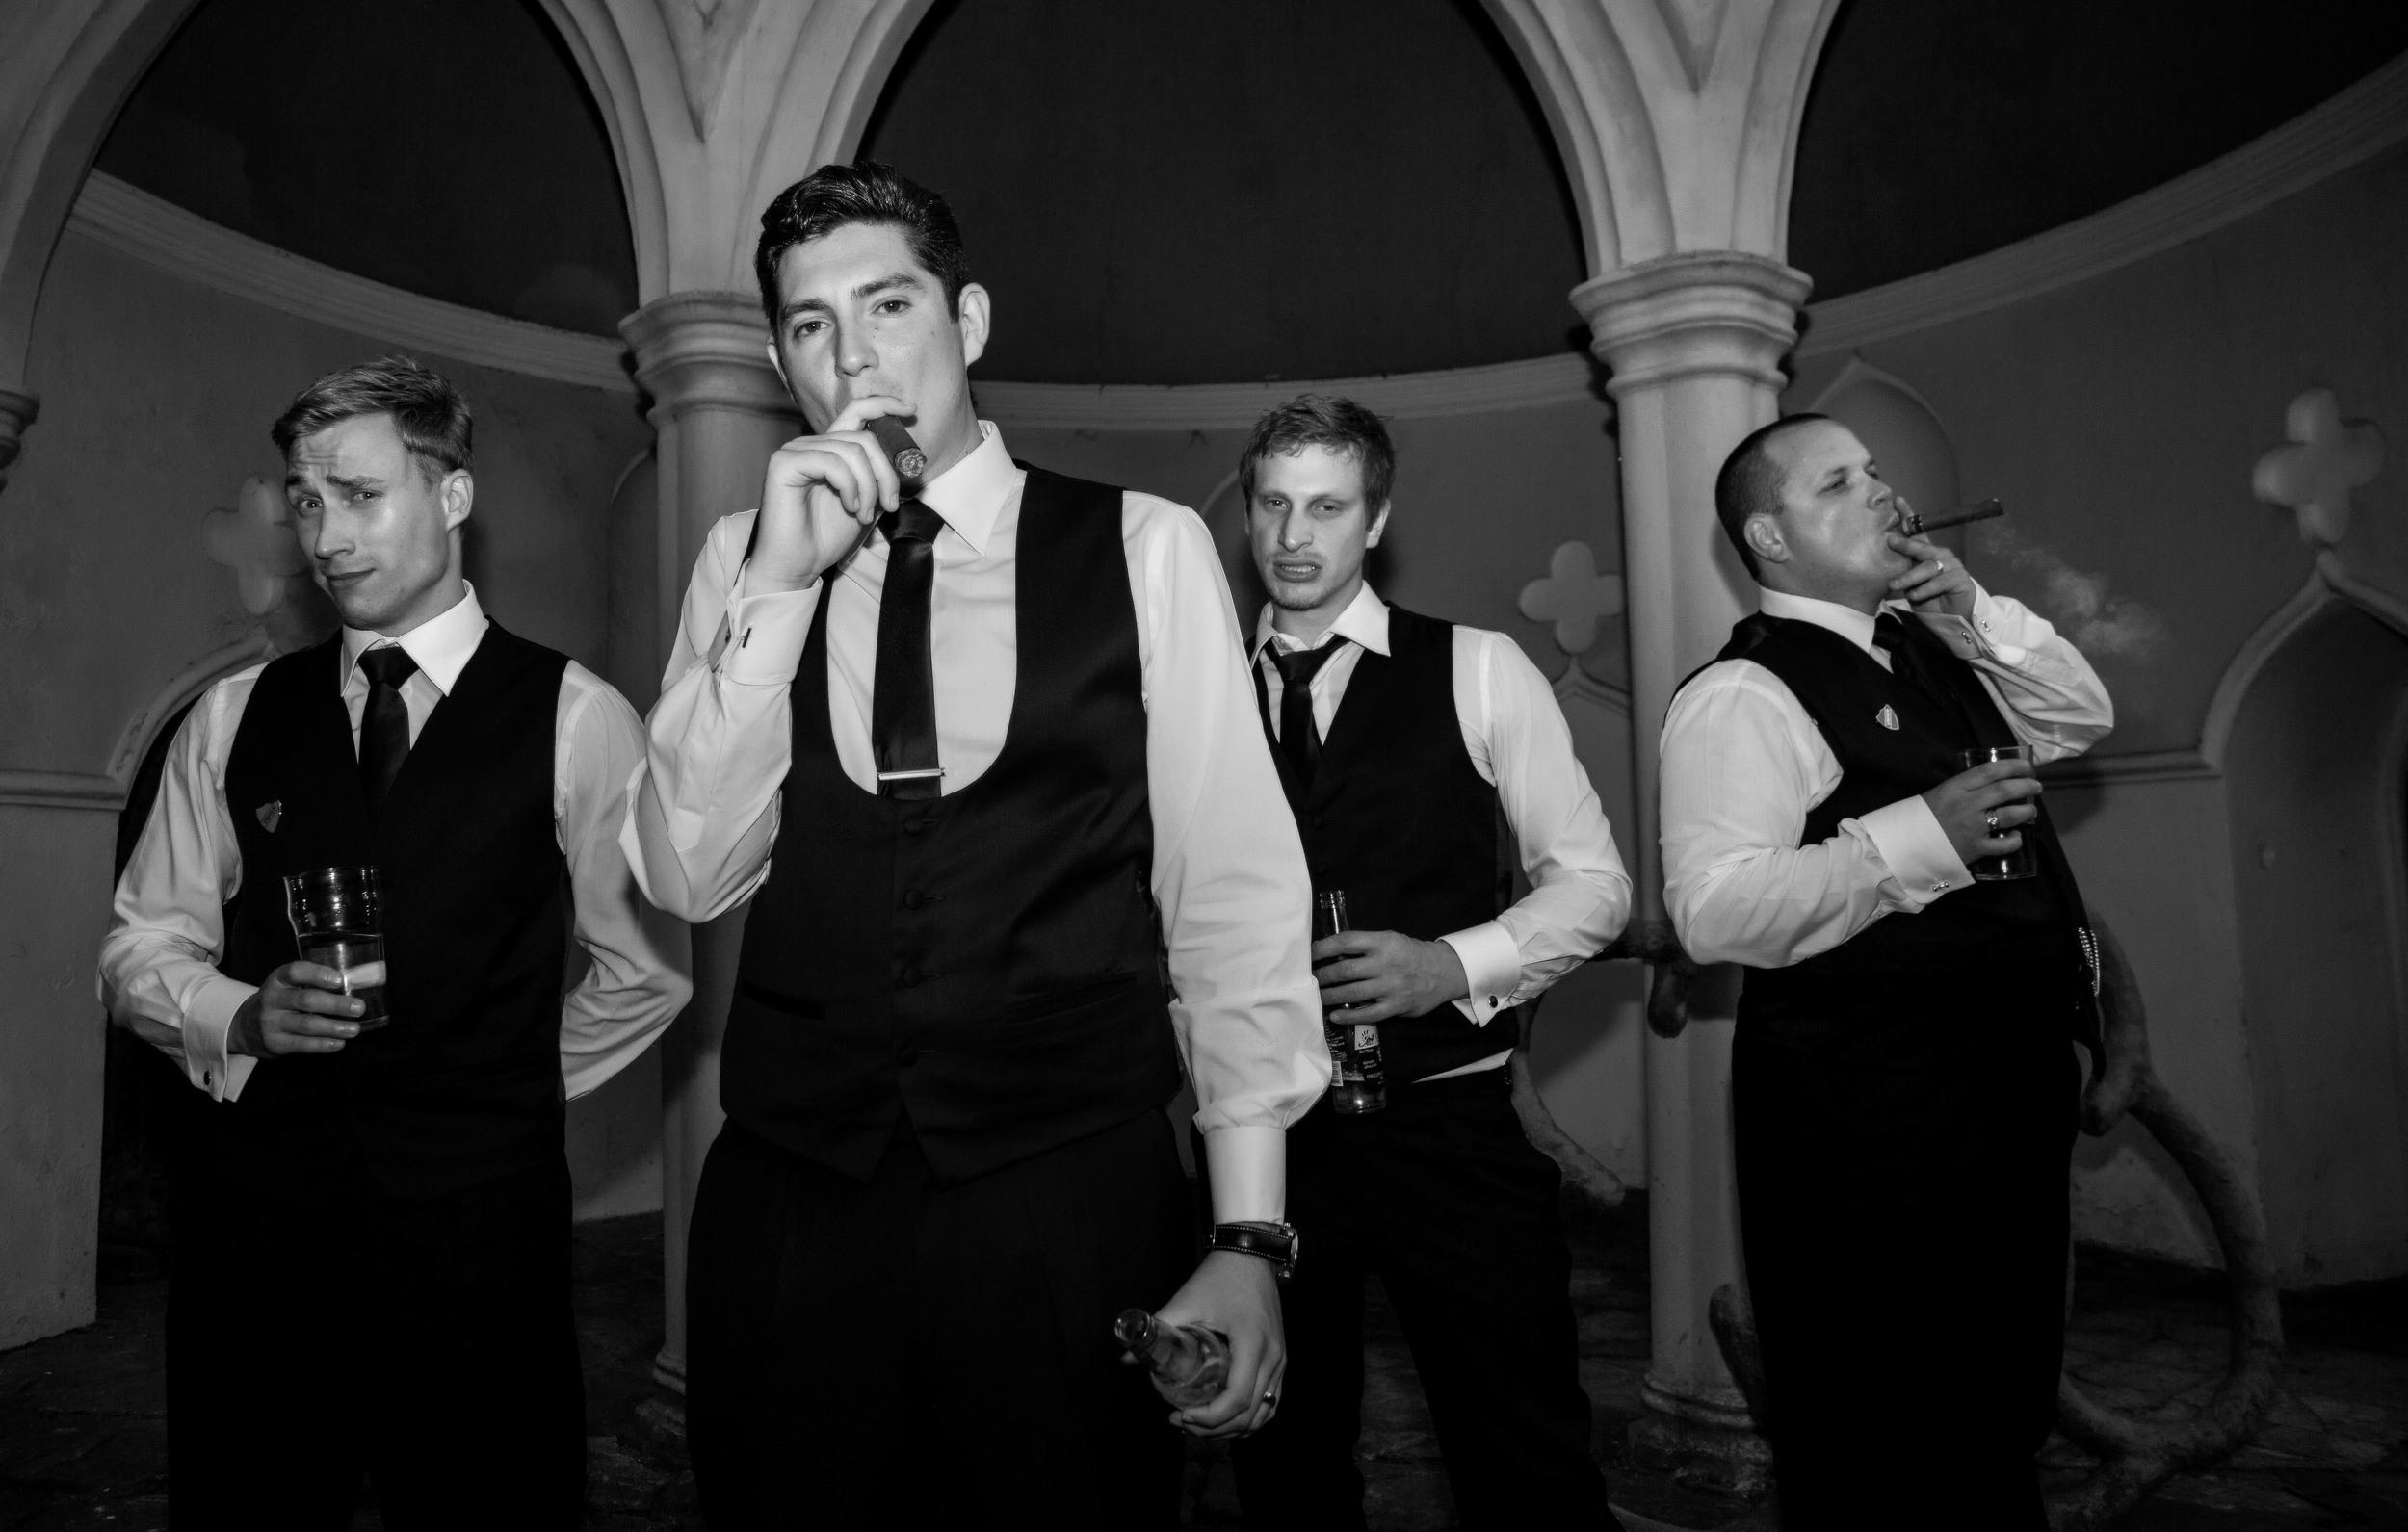 colchester-groomsmen-cigar-posing-london-uk-destination-wedding-photography-Adam-Rowley